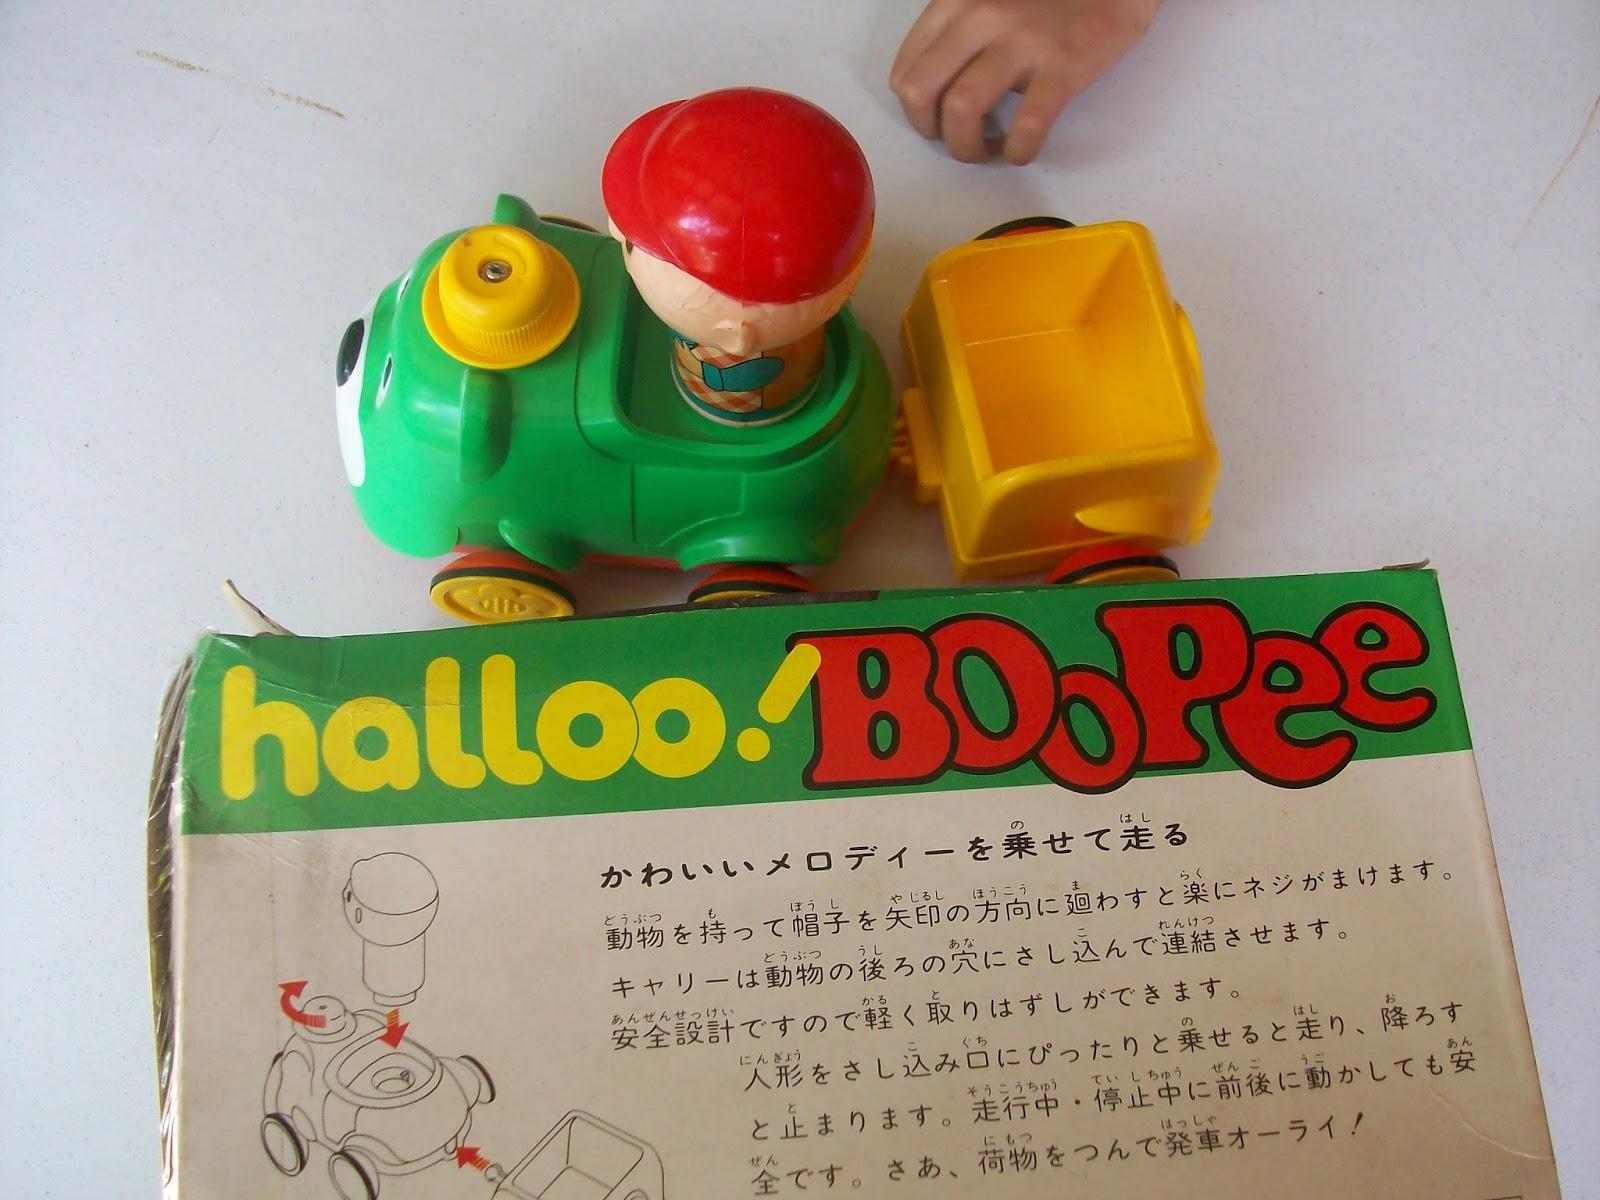 Untuk bahannya sangat berkualitas pas buat bayi anda atau mungkin dikoleksi mainan ini era80an minat hub saya 0812 96